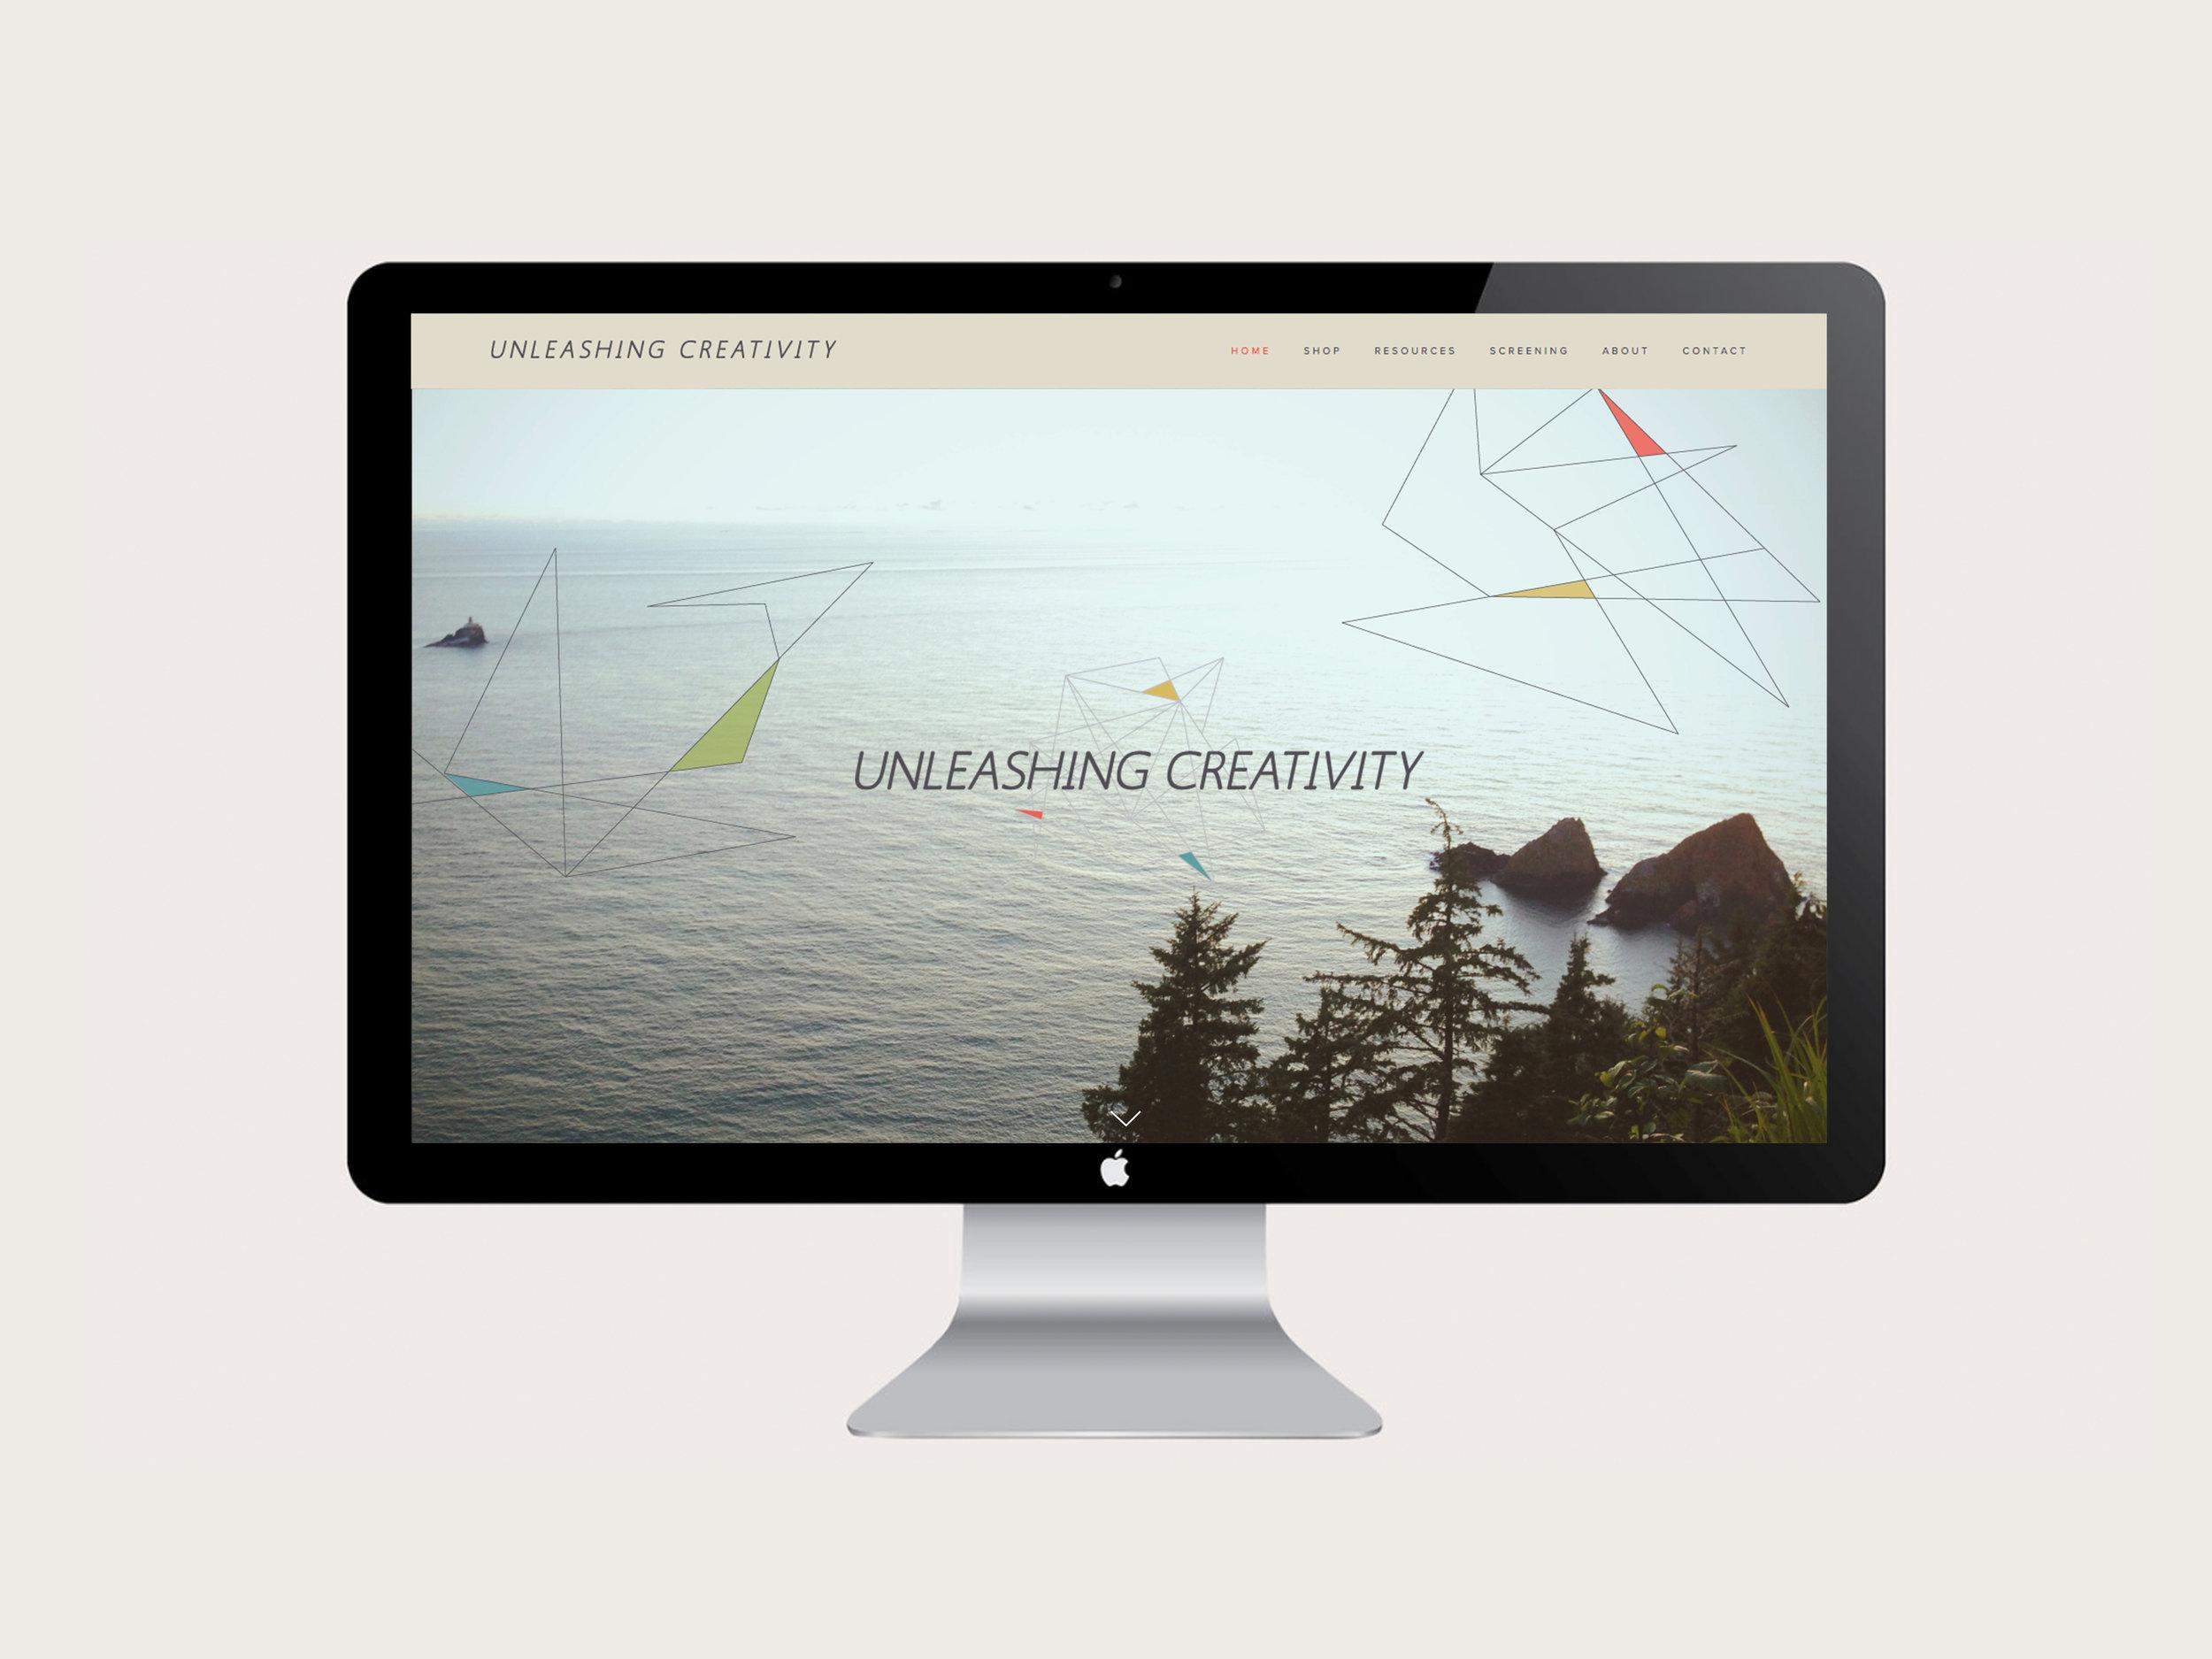 uc-web.jpg